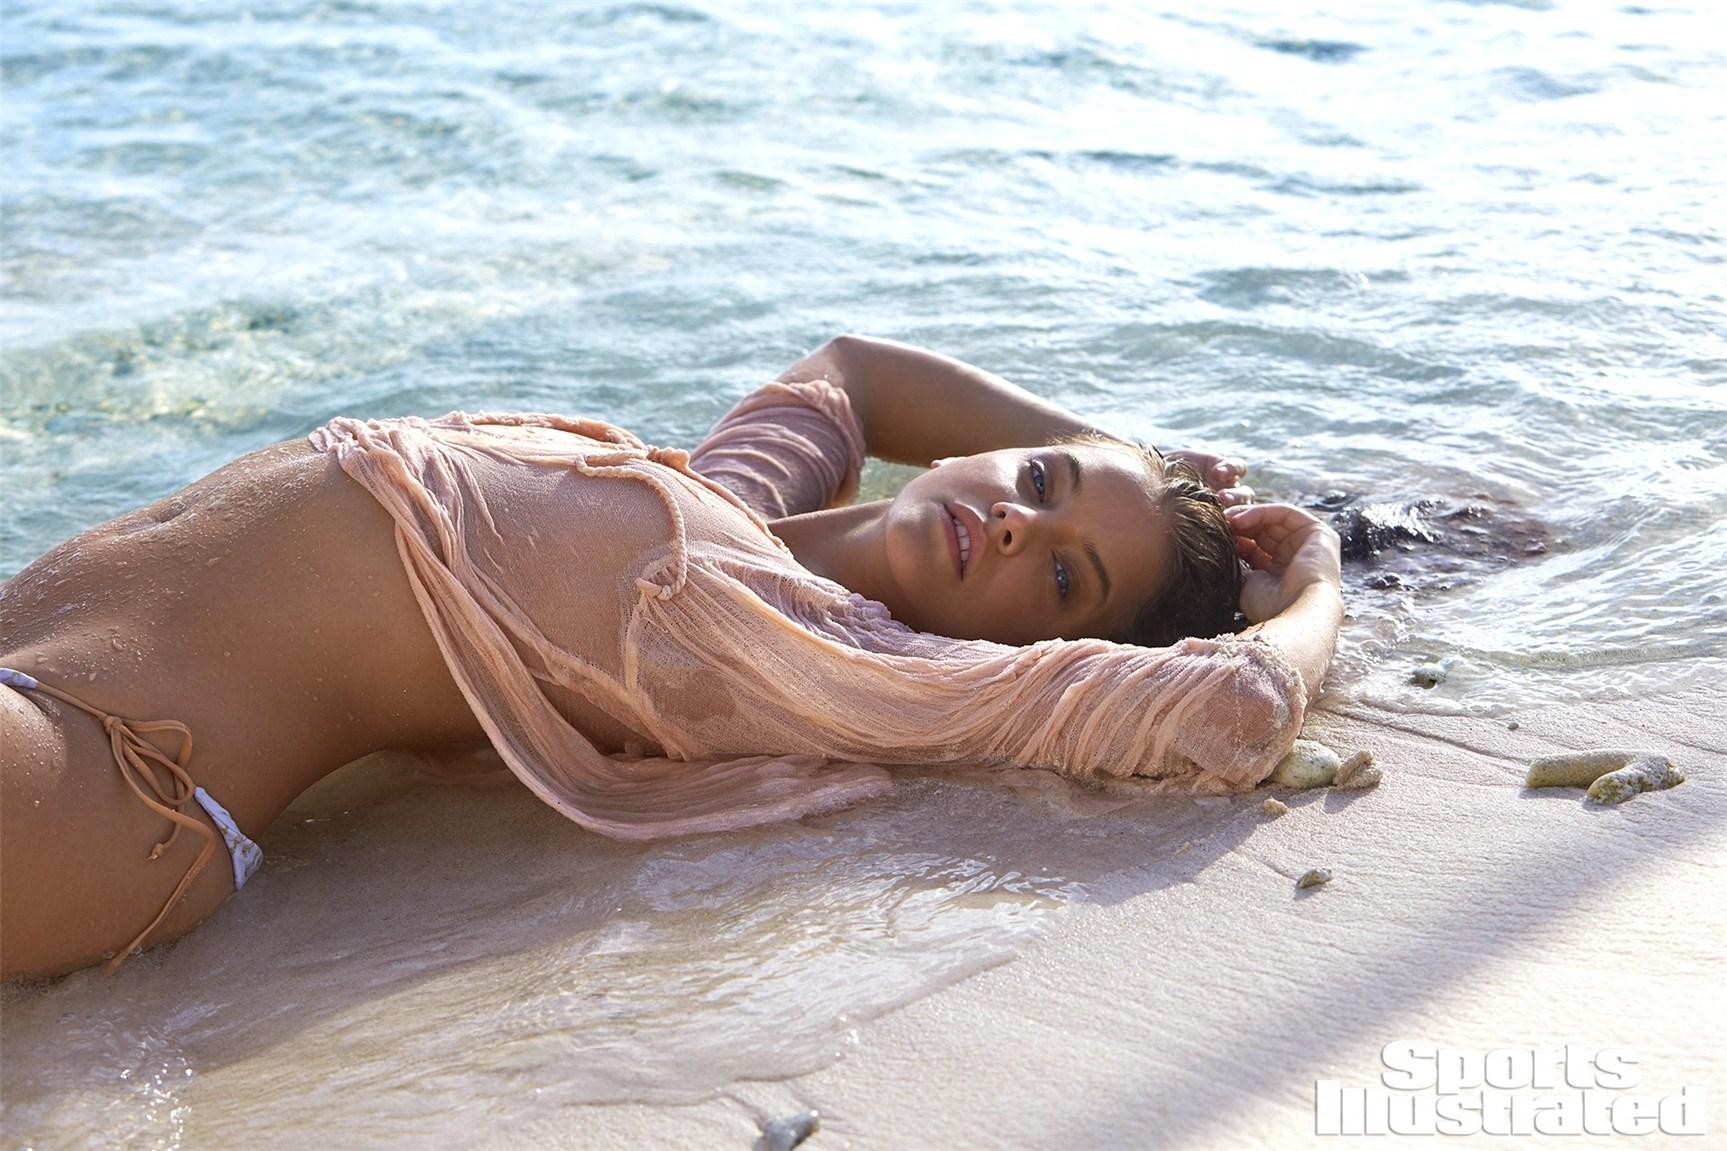 Barbara Palvin / Барбара Палвин в купальниках из новой коллекции Sports Illustrated Swimsuit 2017 issue / in Curacao by Ben Watts